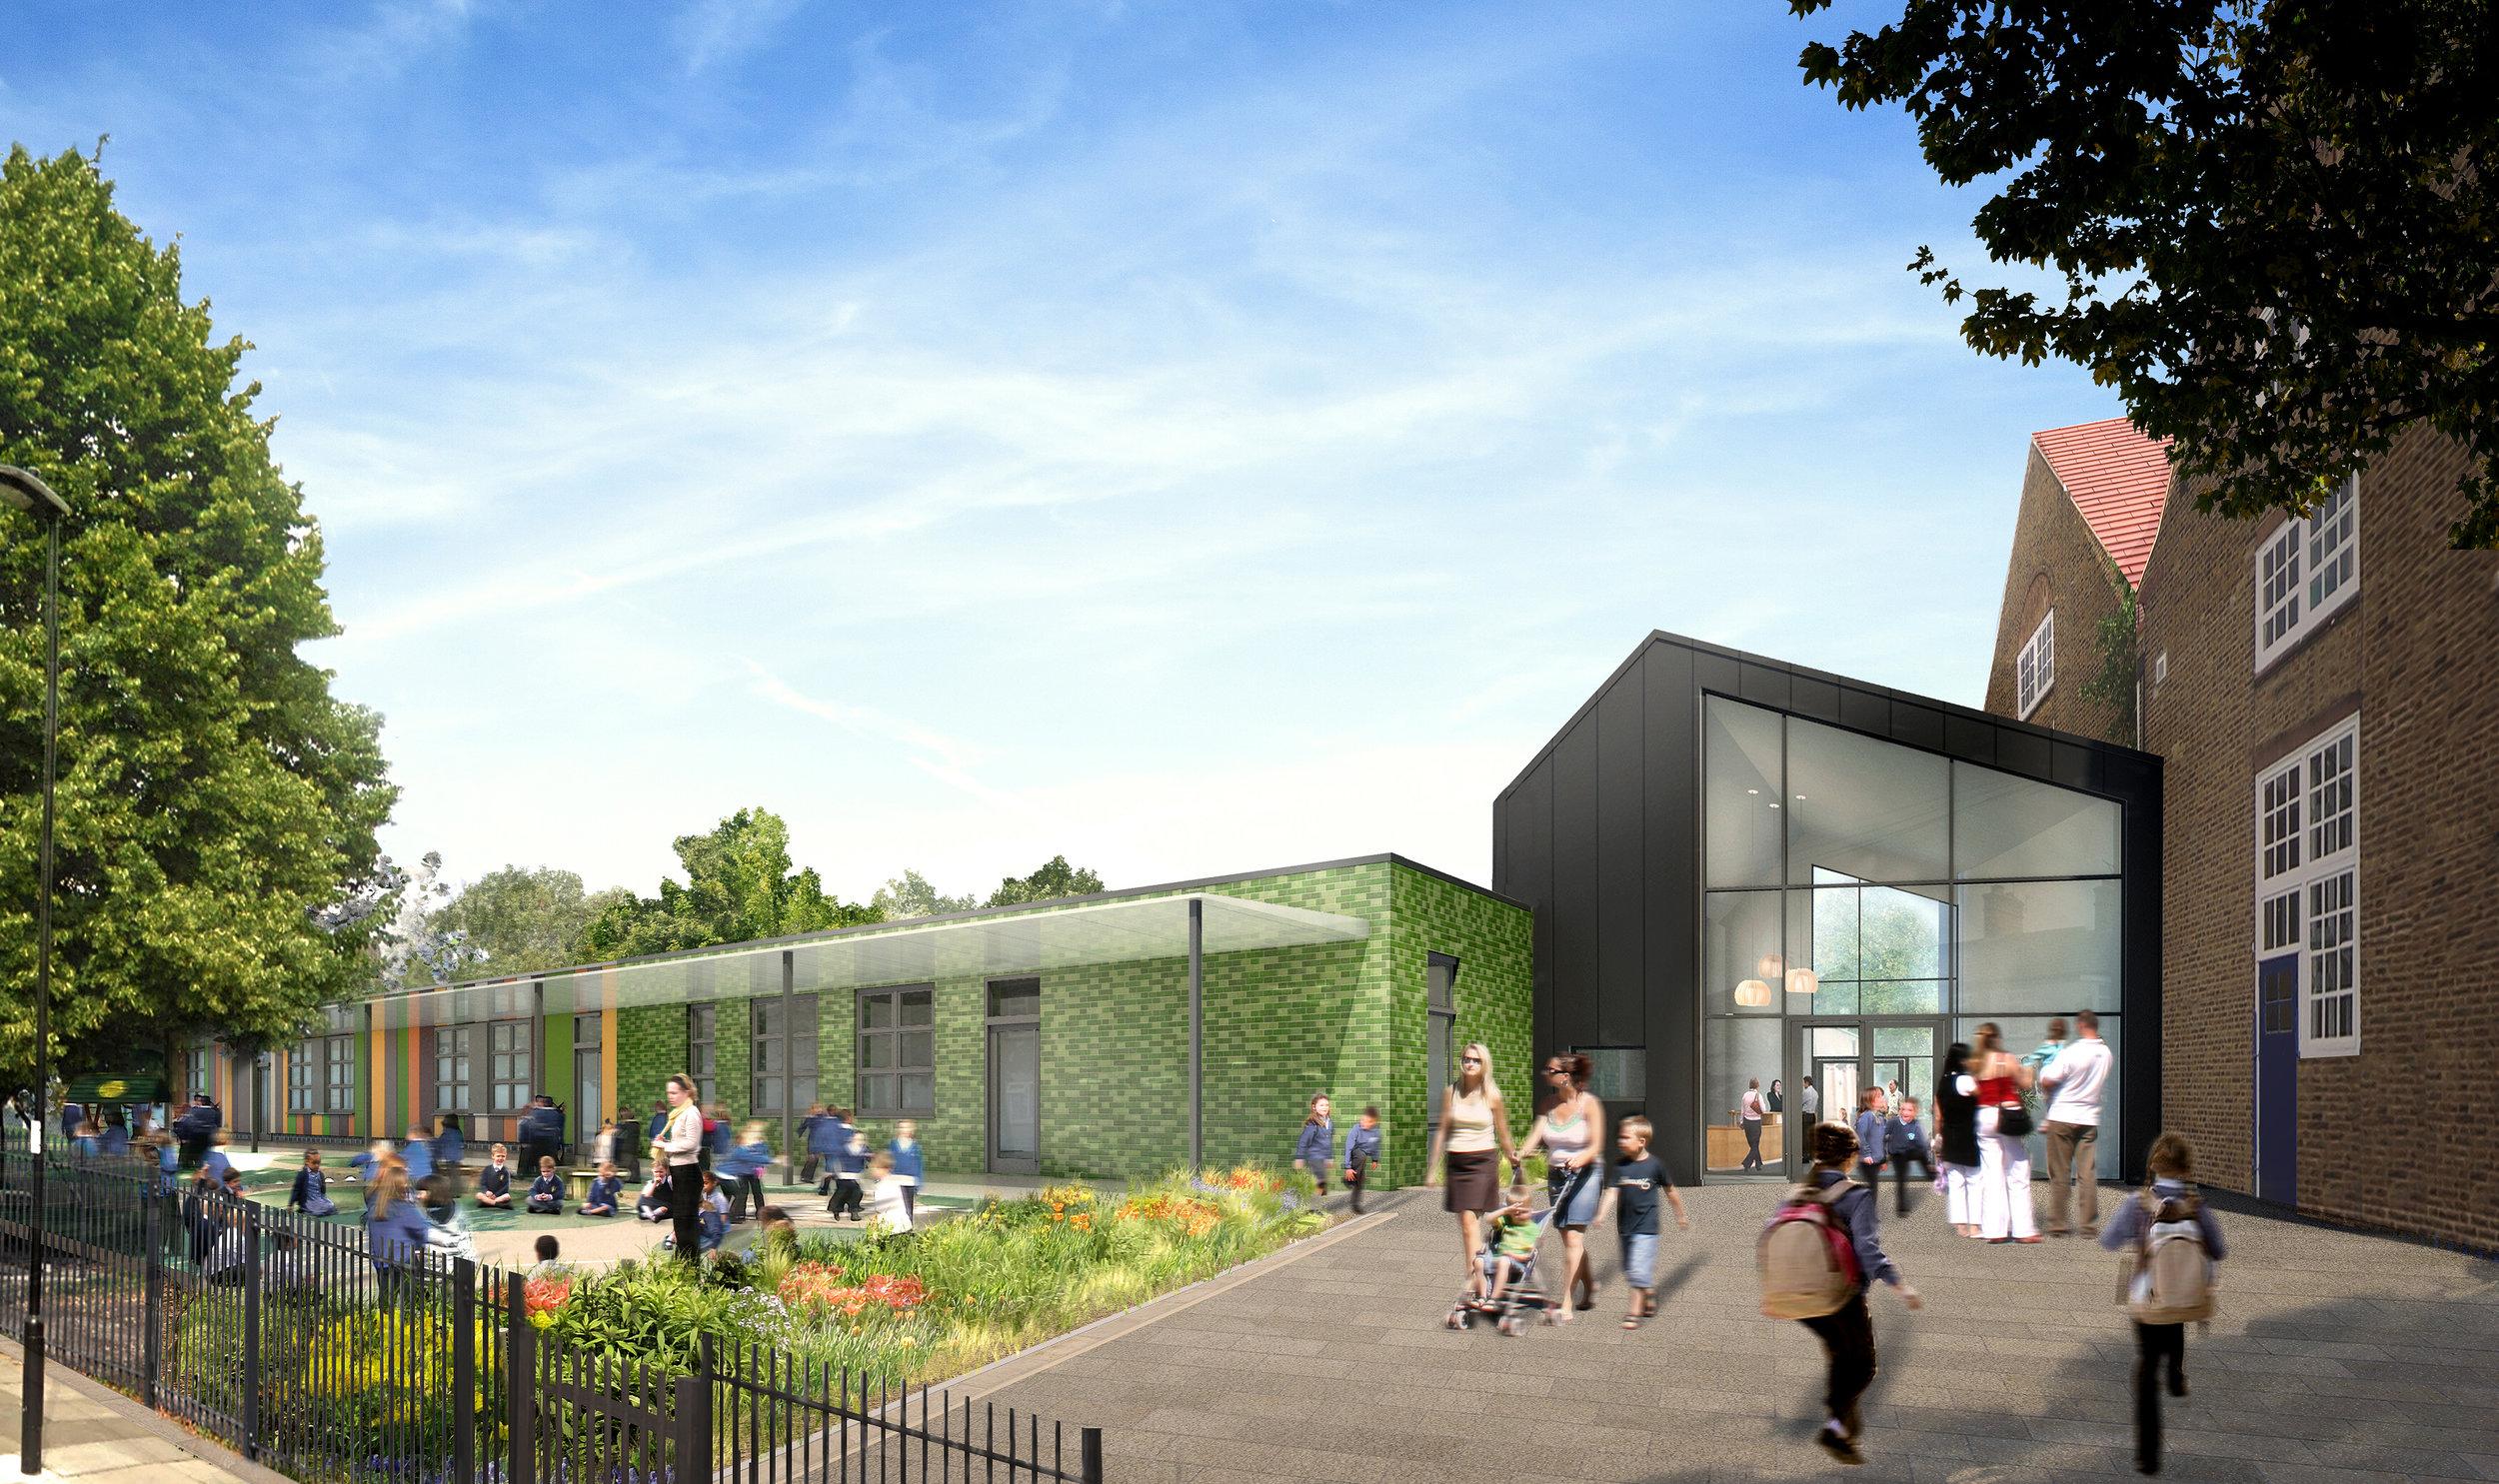 SA1301_Enfield Schools_Highfield Primary School_Entrance View_06_FullRes.jpg